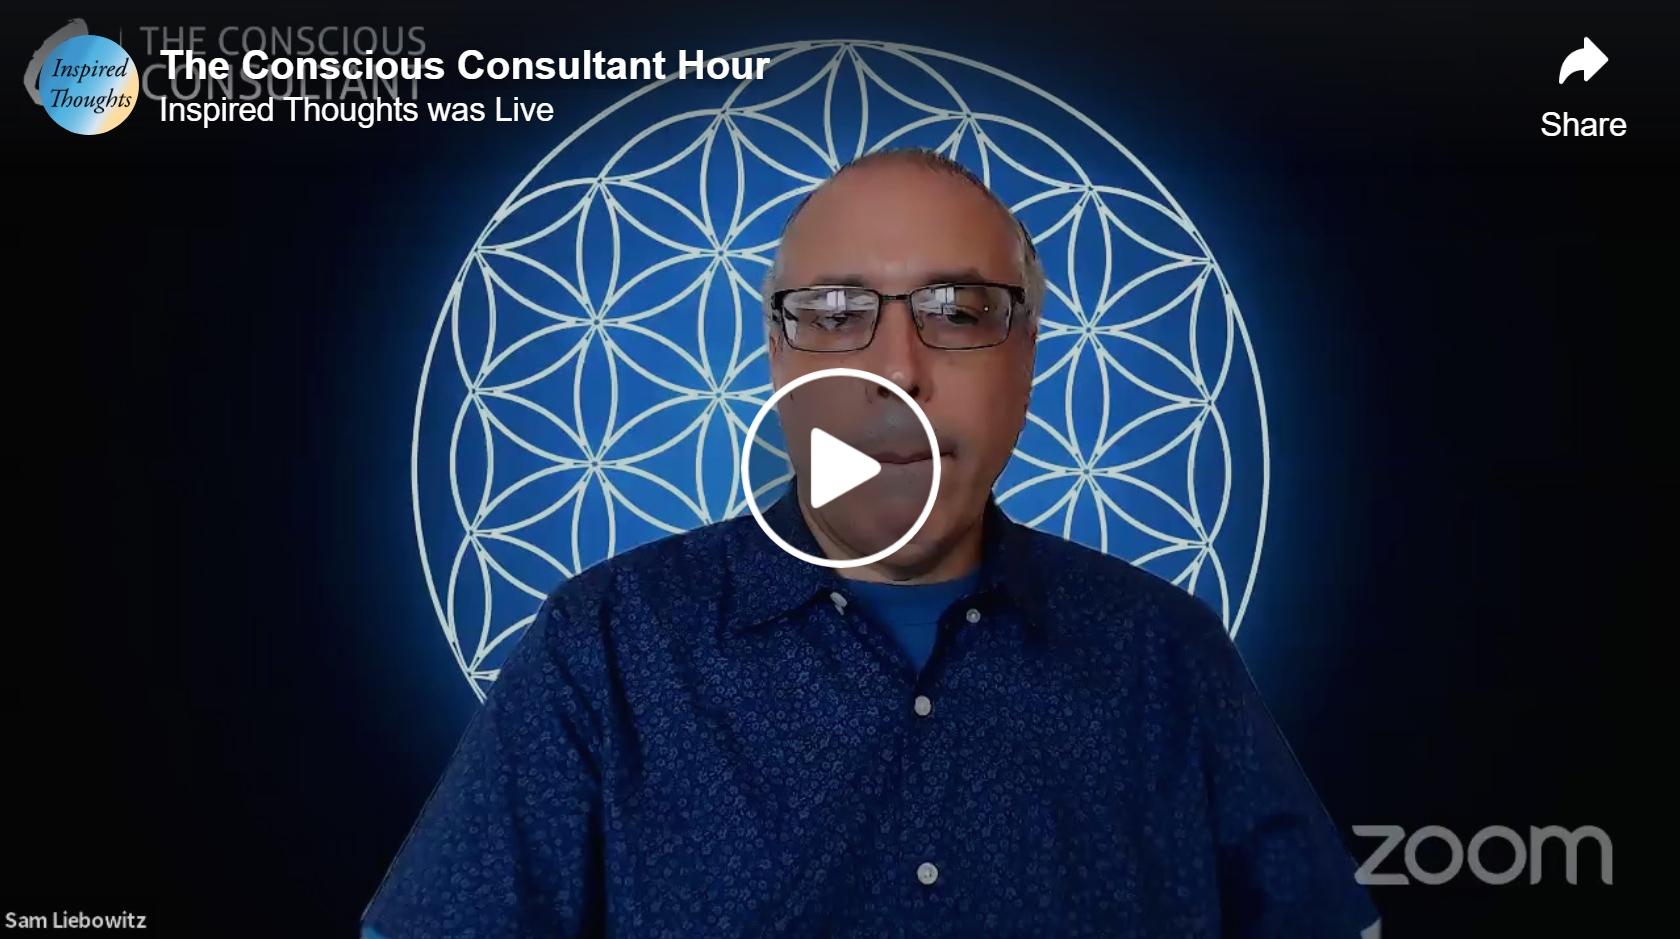 Facebook Live Video from 2020/09/17 - Awaken Your Third Eye